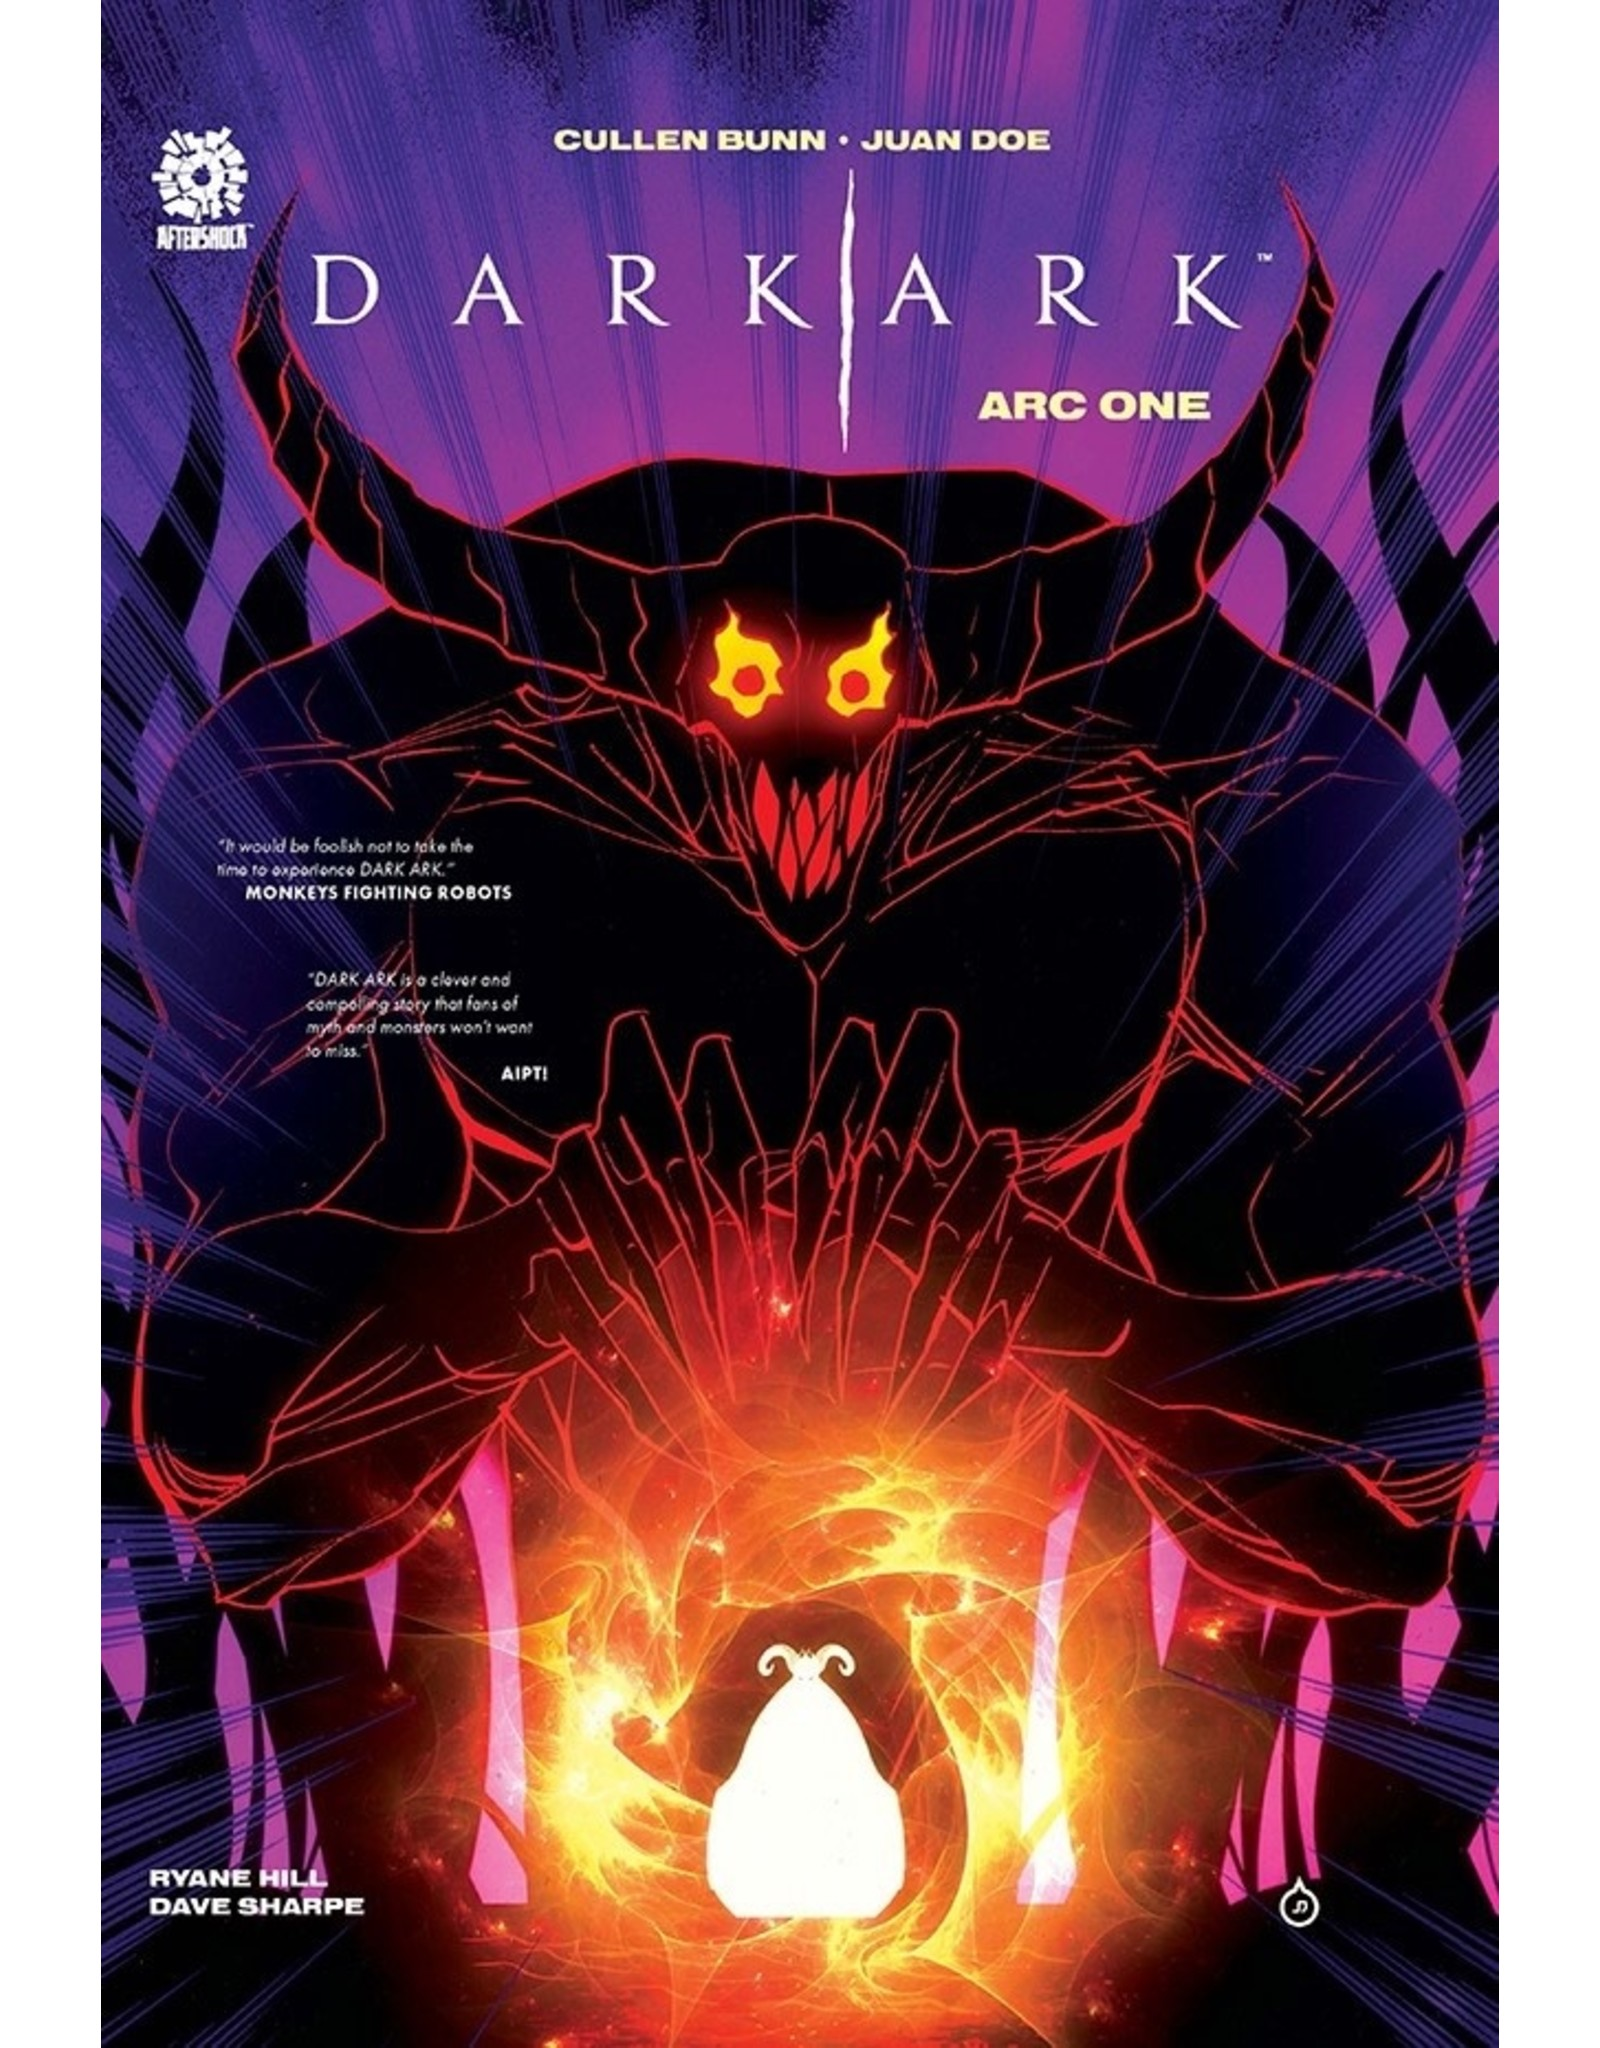 AFTERSHOCK COMICS DARK ARK HC VOL 01 ARC ONE